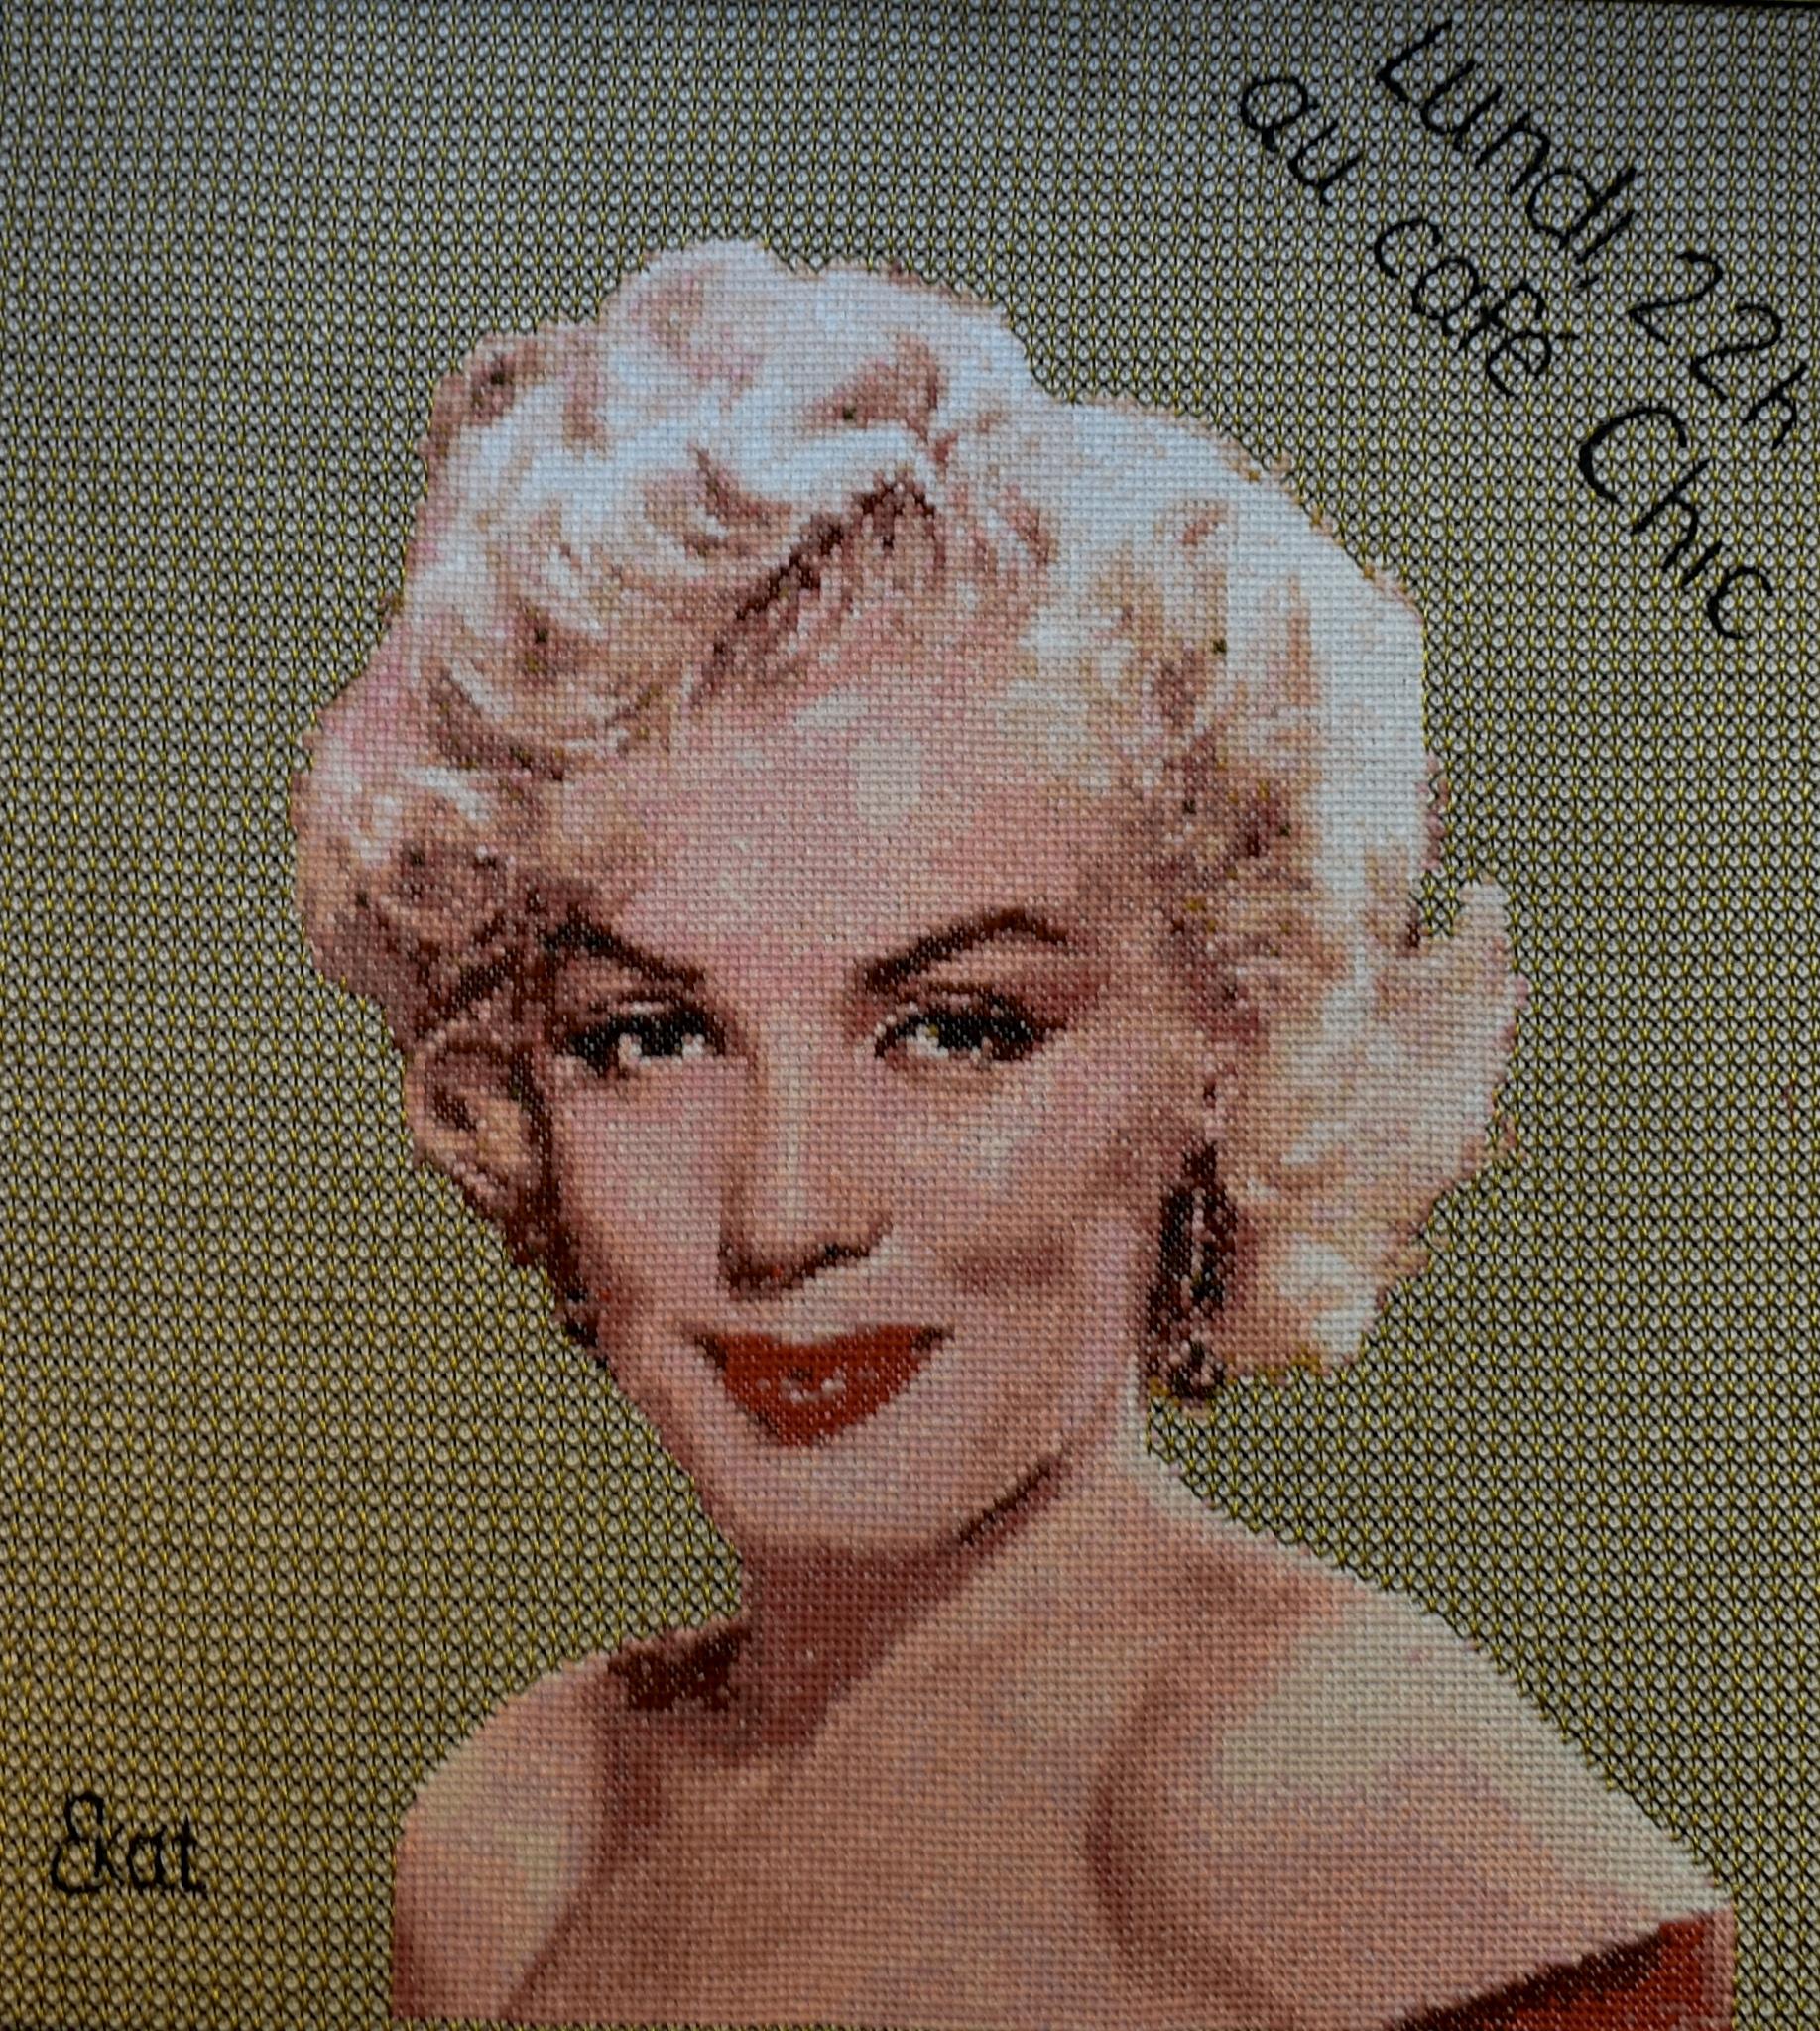 Monroe attend